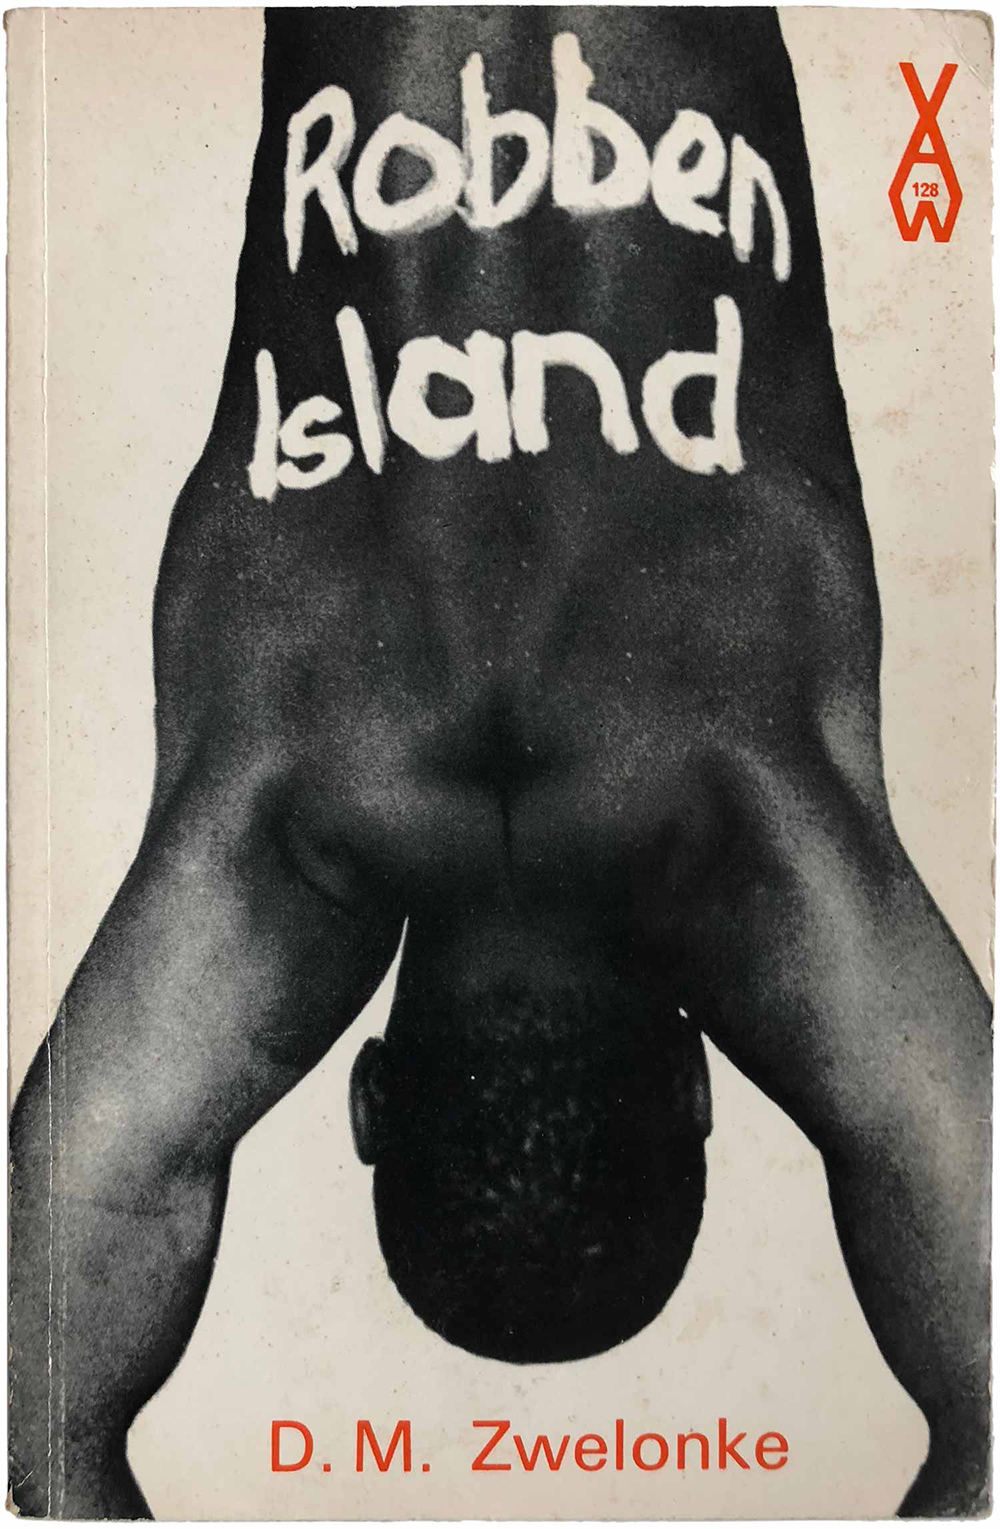 """Robben Island,"" by D.M. Zwelonke (AWS 128, 1973)."